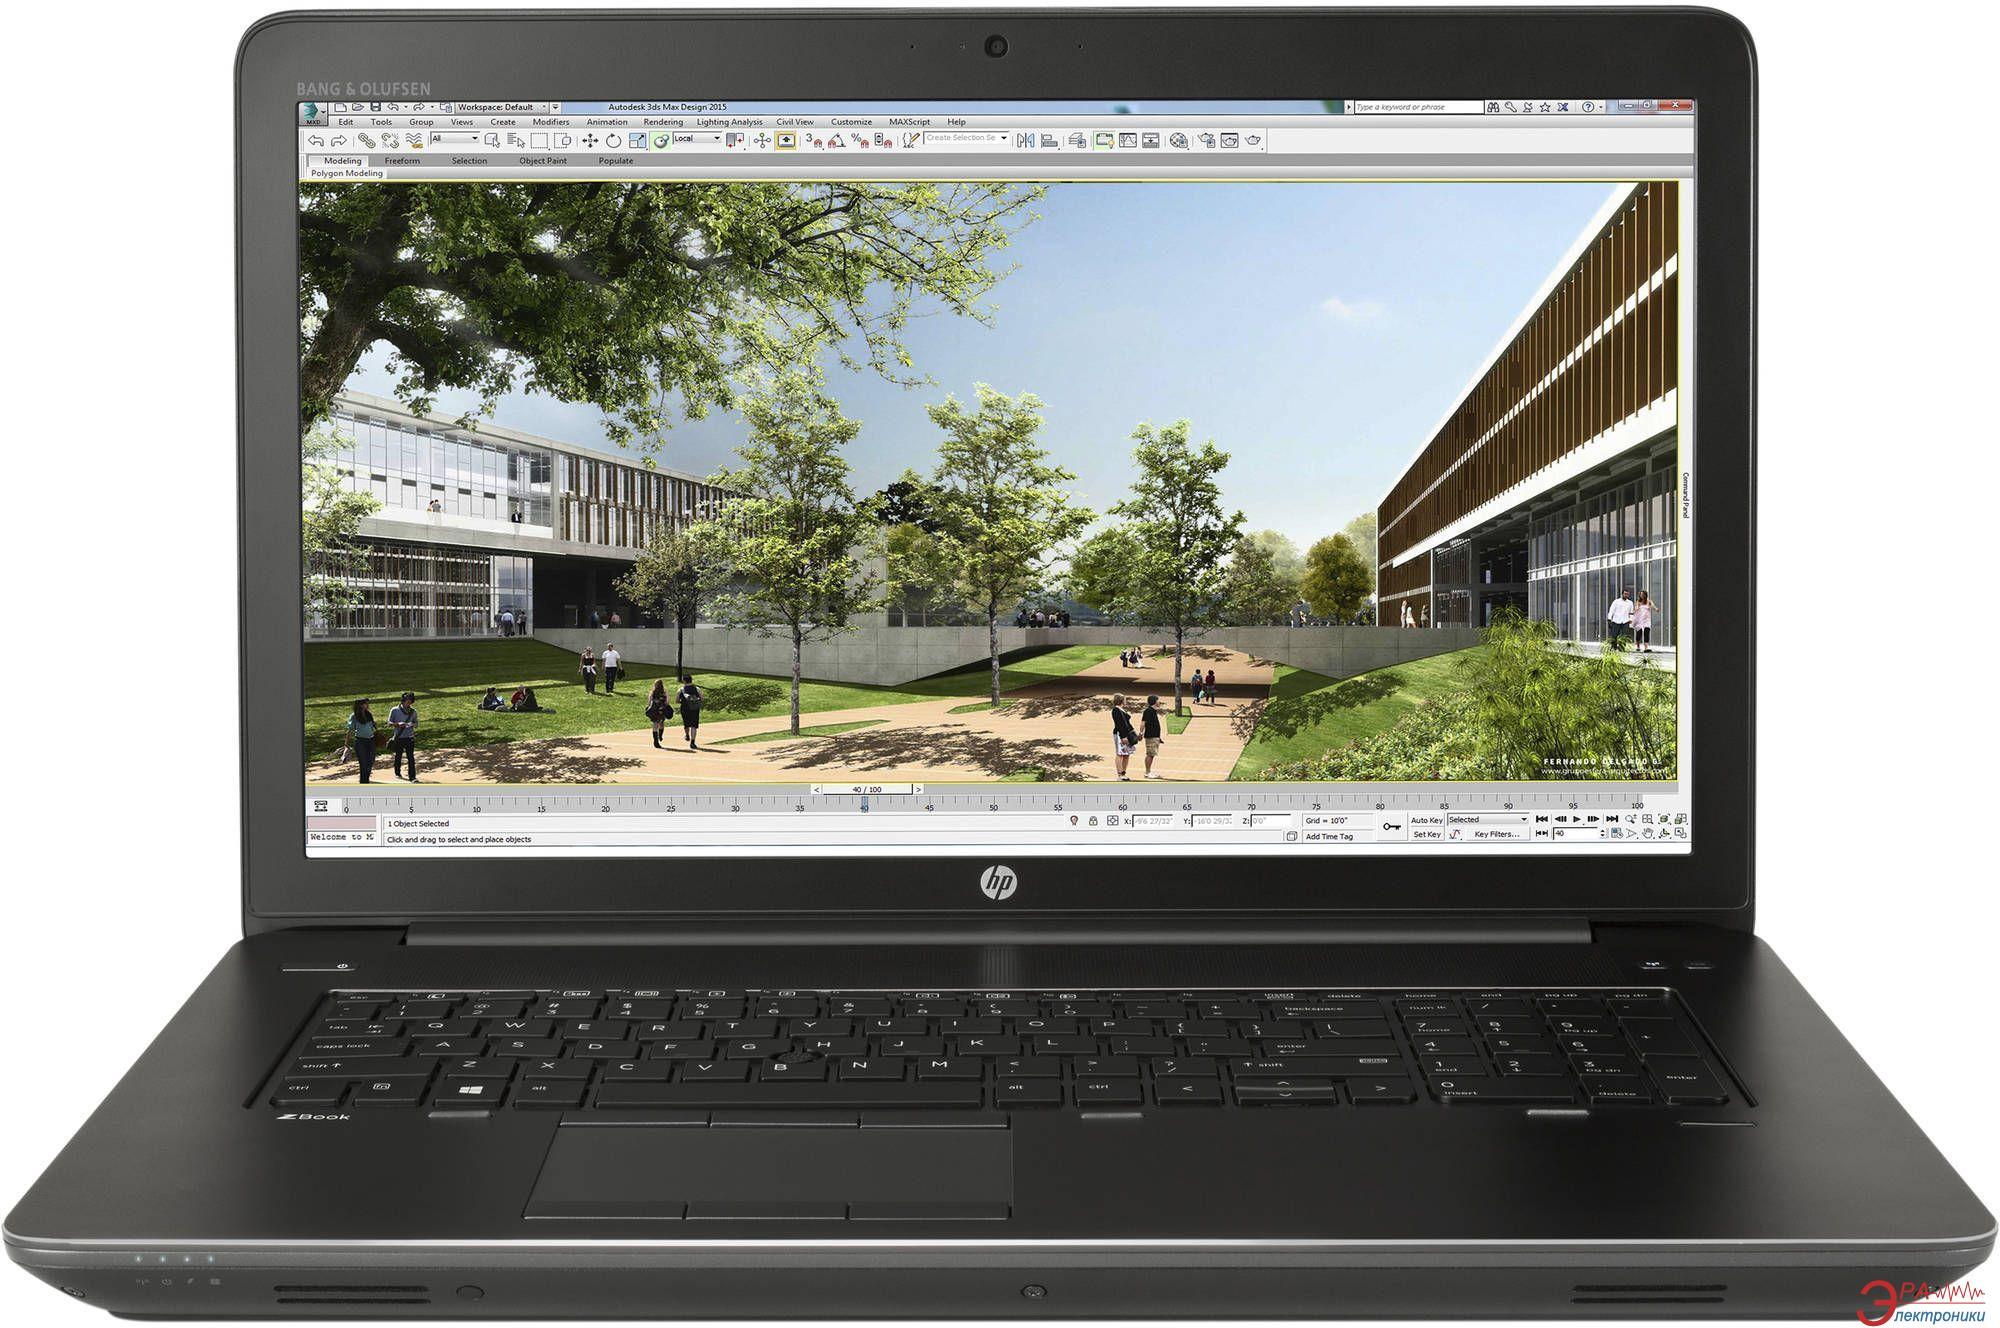 Ноутбук HP Zbook 17 G3 (T7V63EA) Black 17,3